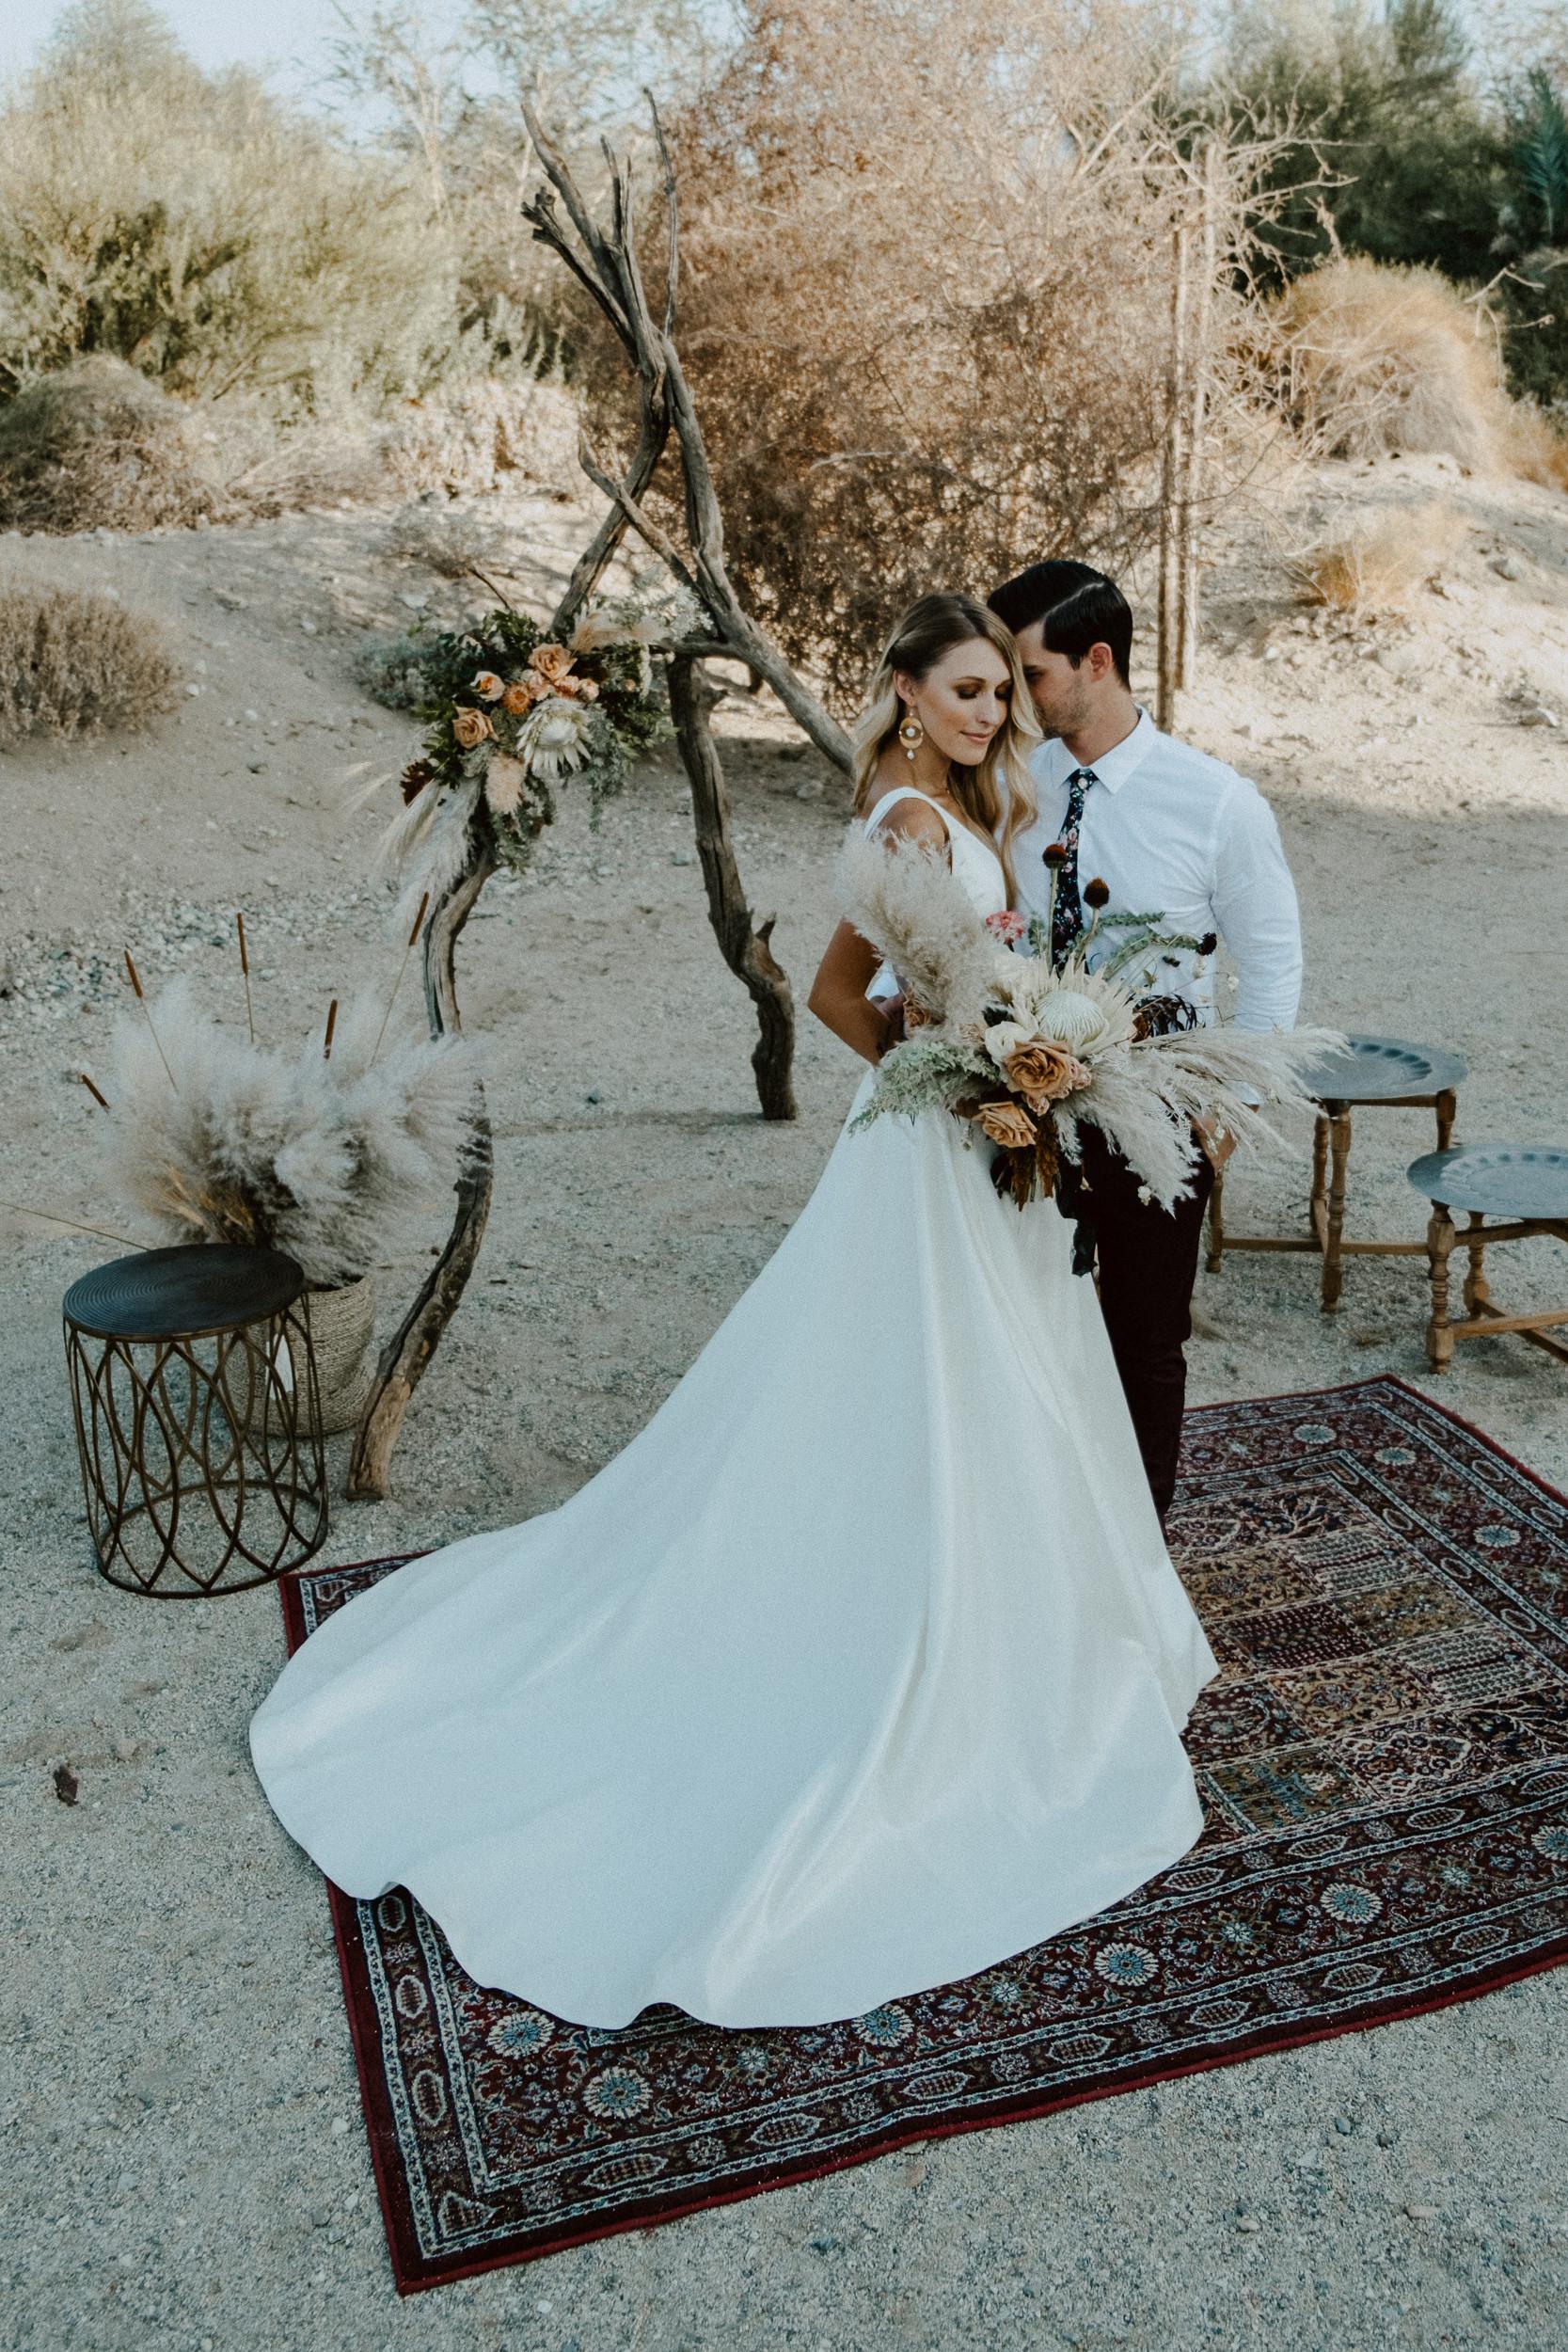 sChelsie + Chris - The Desert Shootout Wedding Romantics at The Living Desert-4.jpg